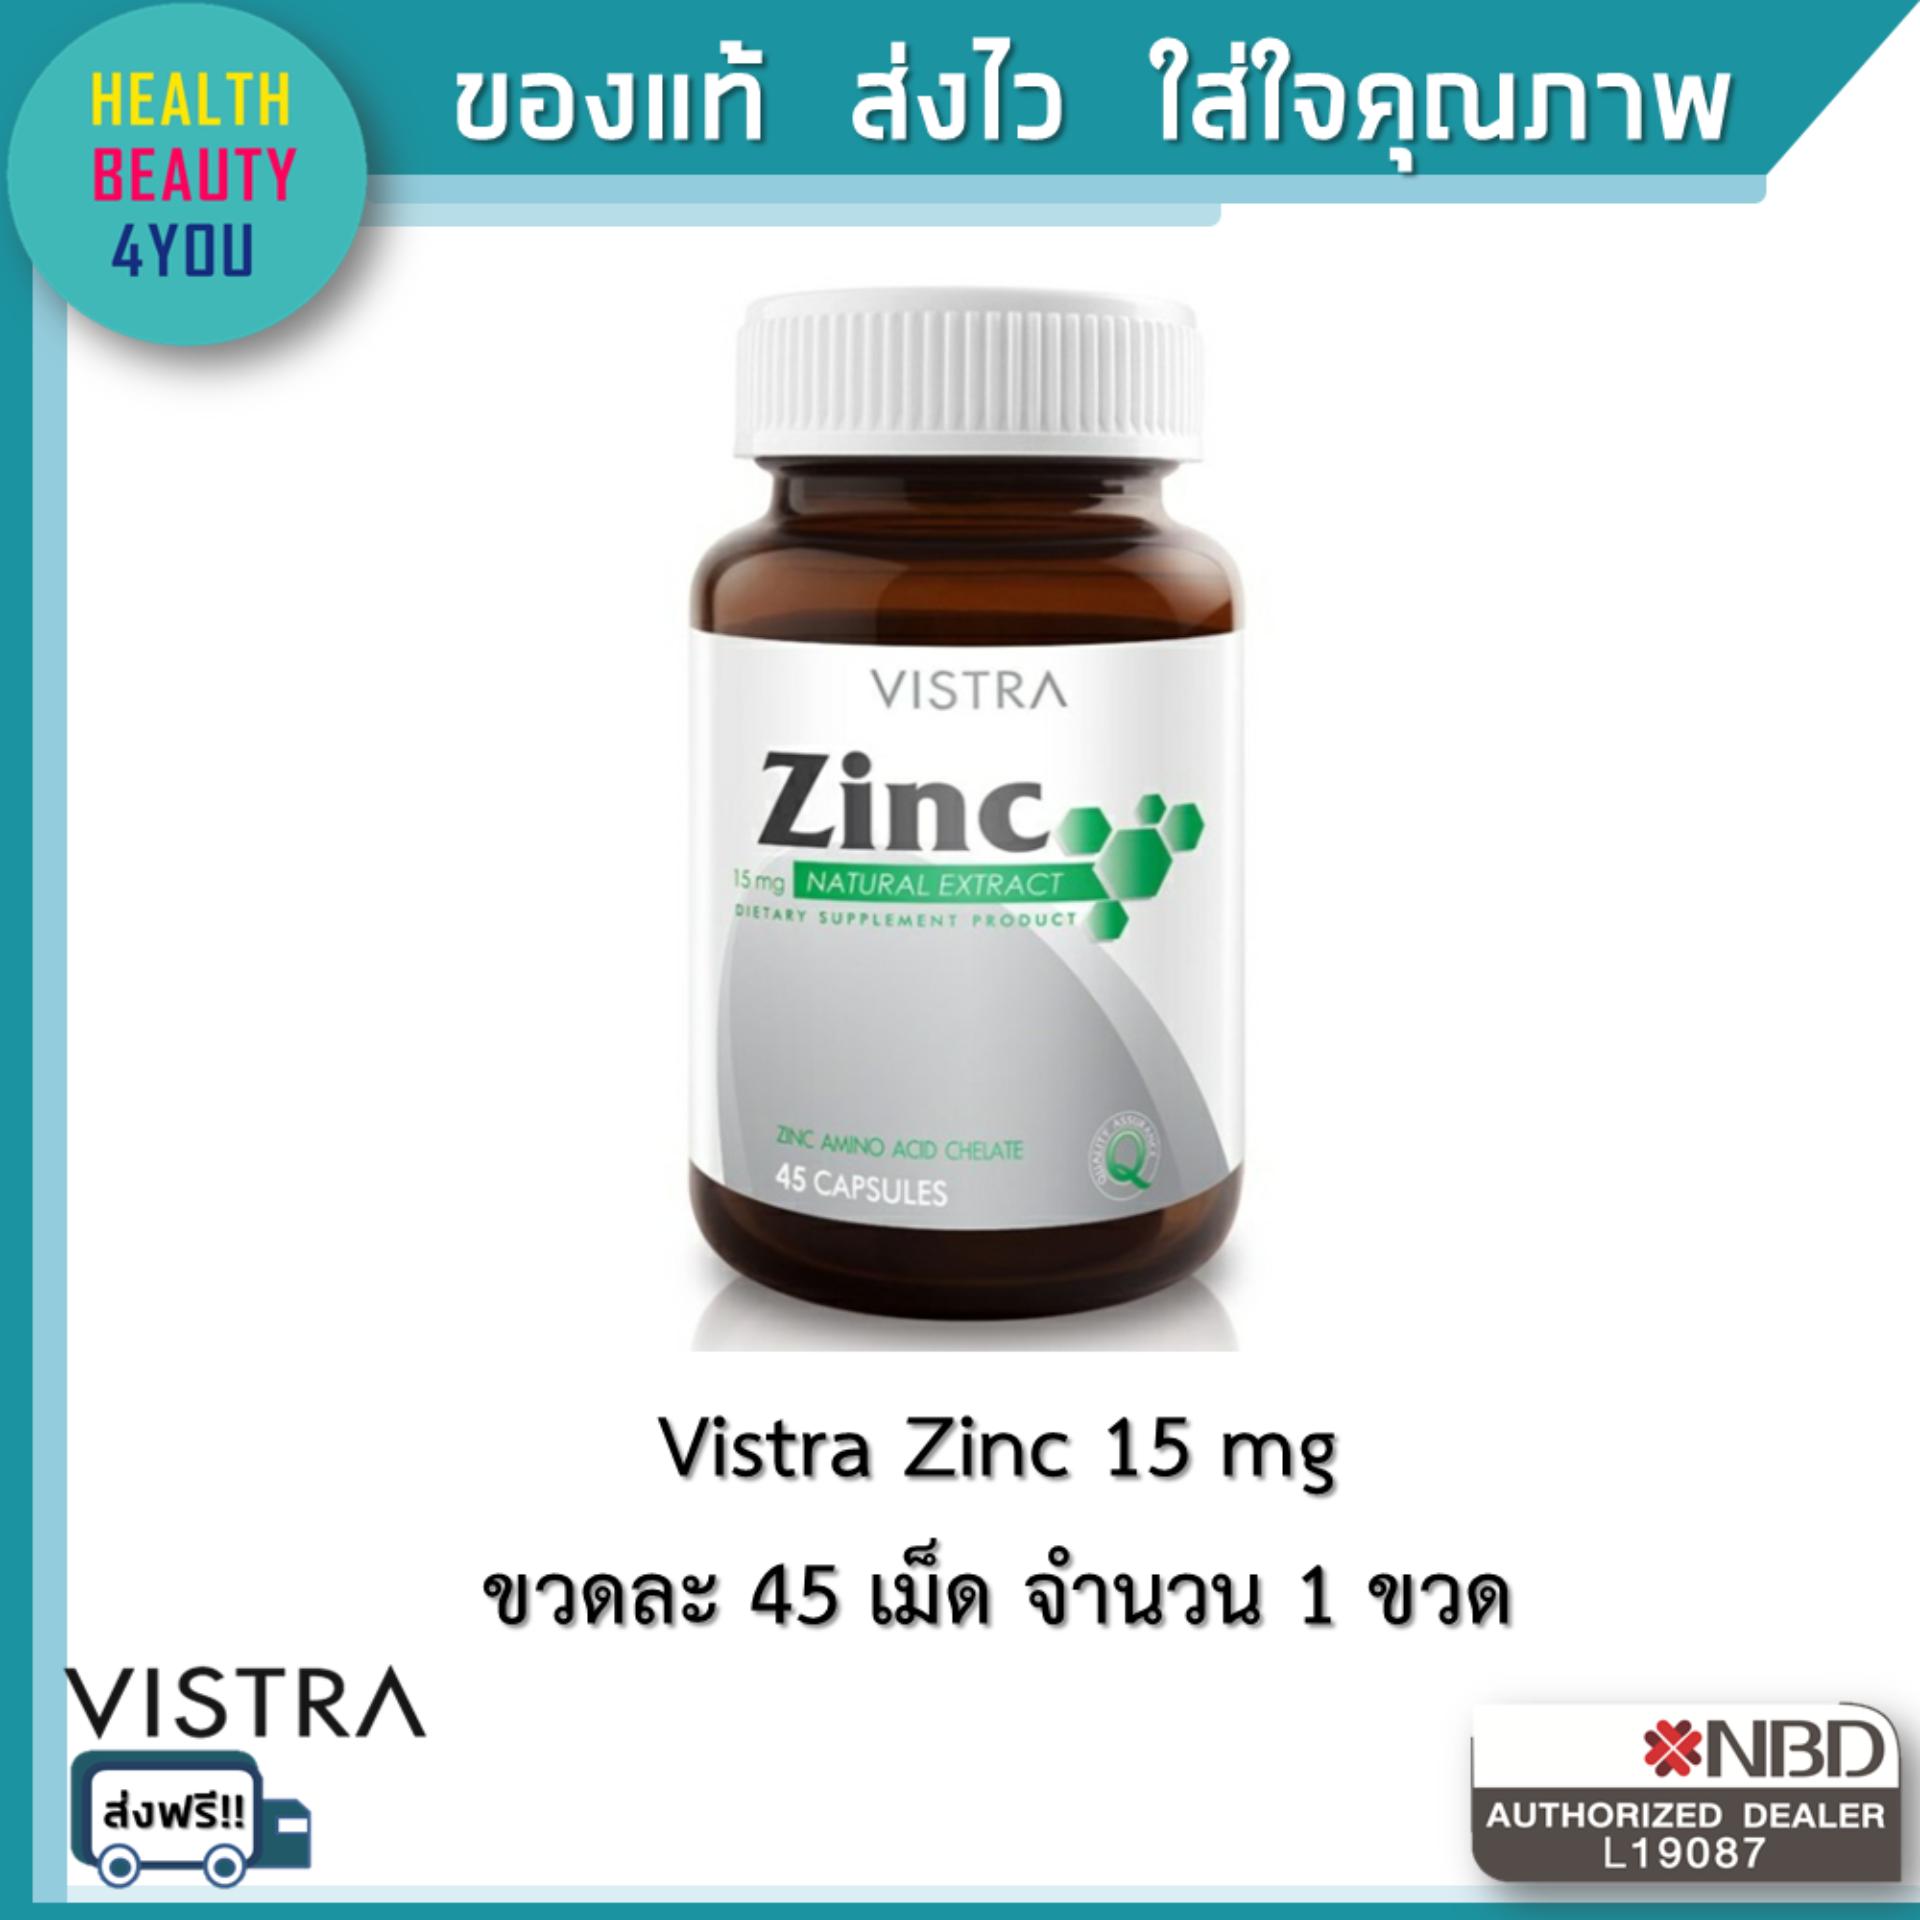 Vistra Zinc 15mg (45 เม็ด) [1 ขวด].